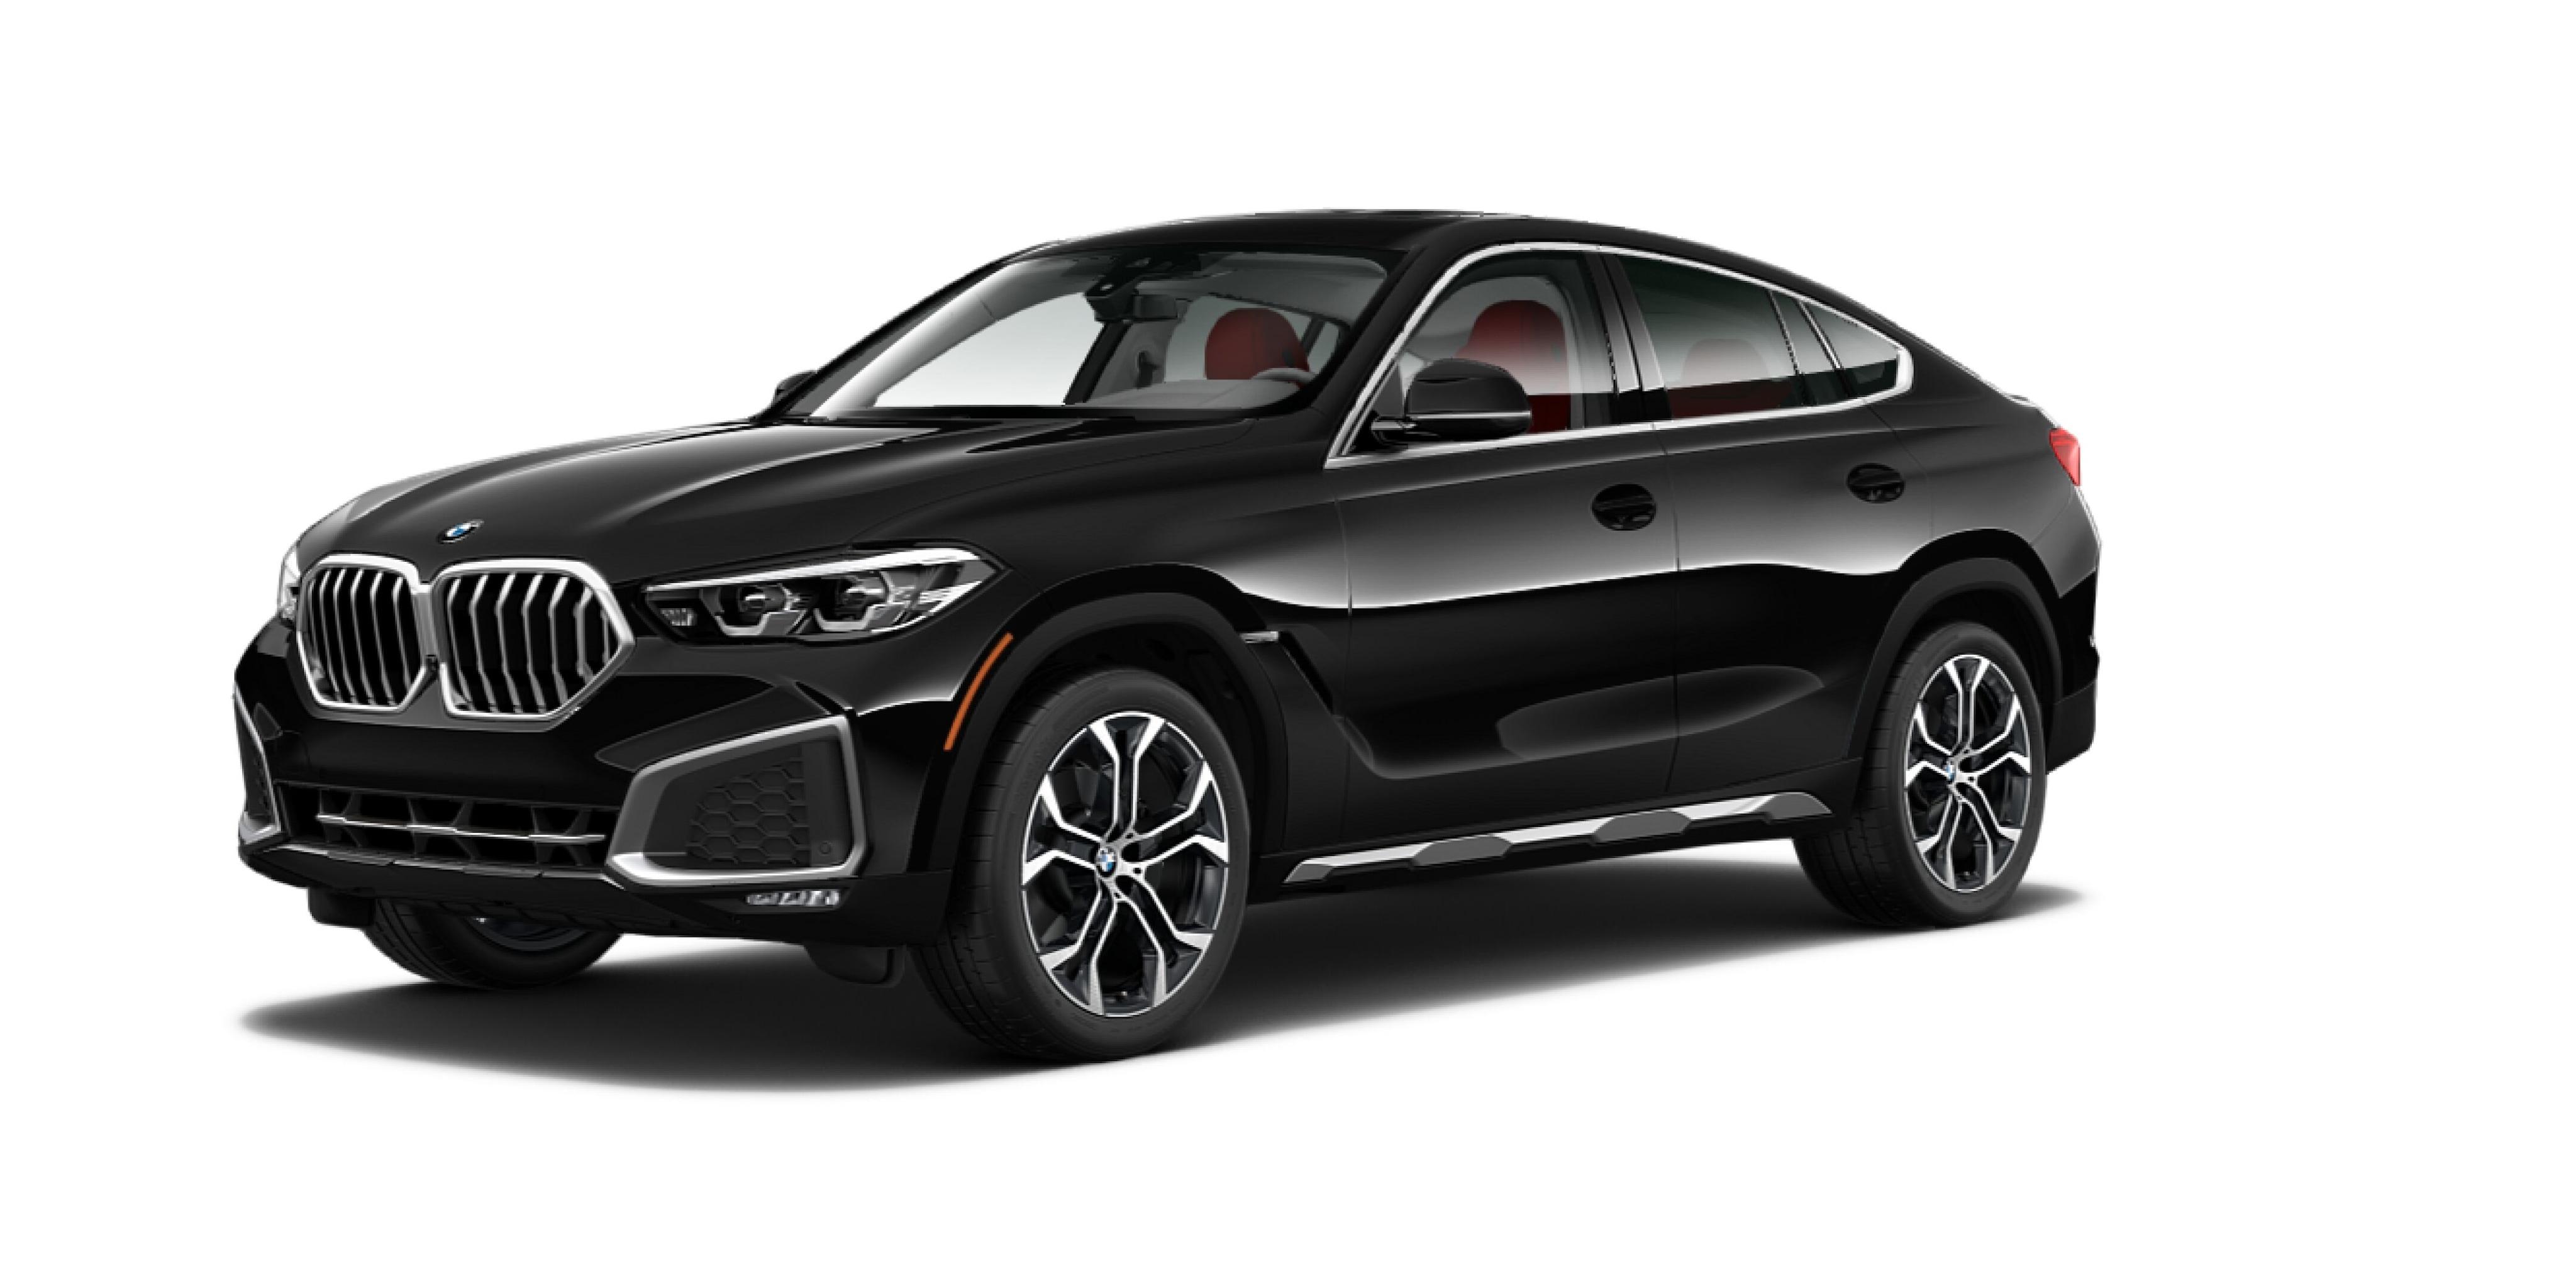 2020 BMW X6 For Sale in San Antonio TX | BMW of San Antonio